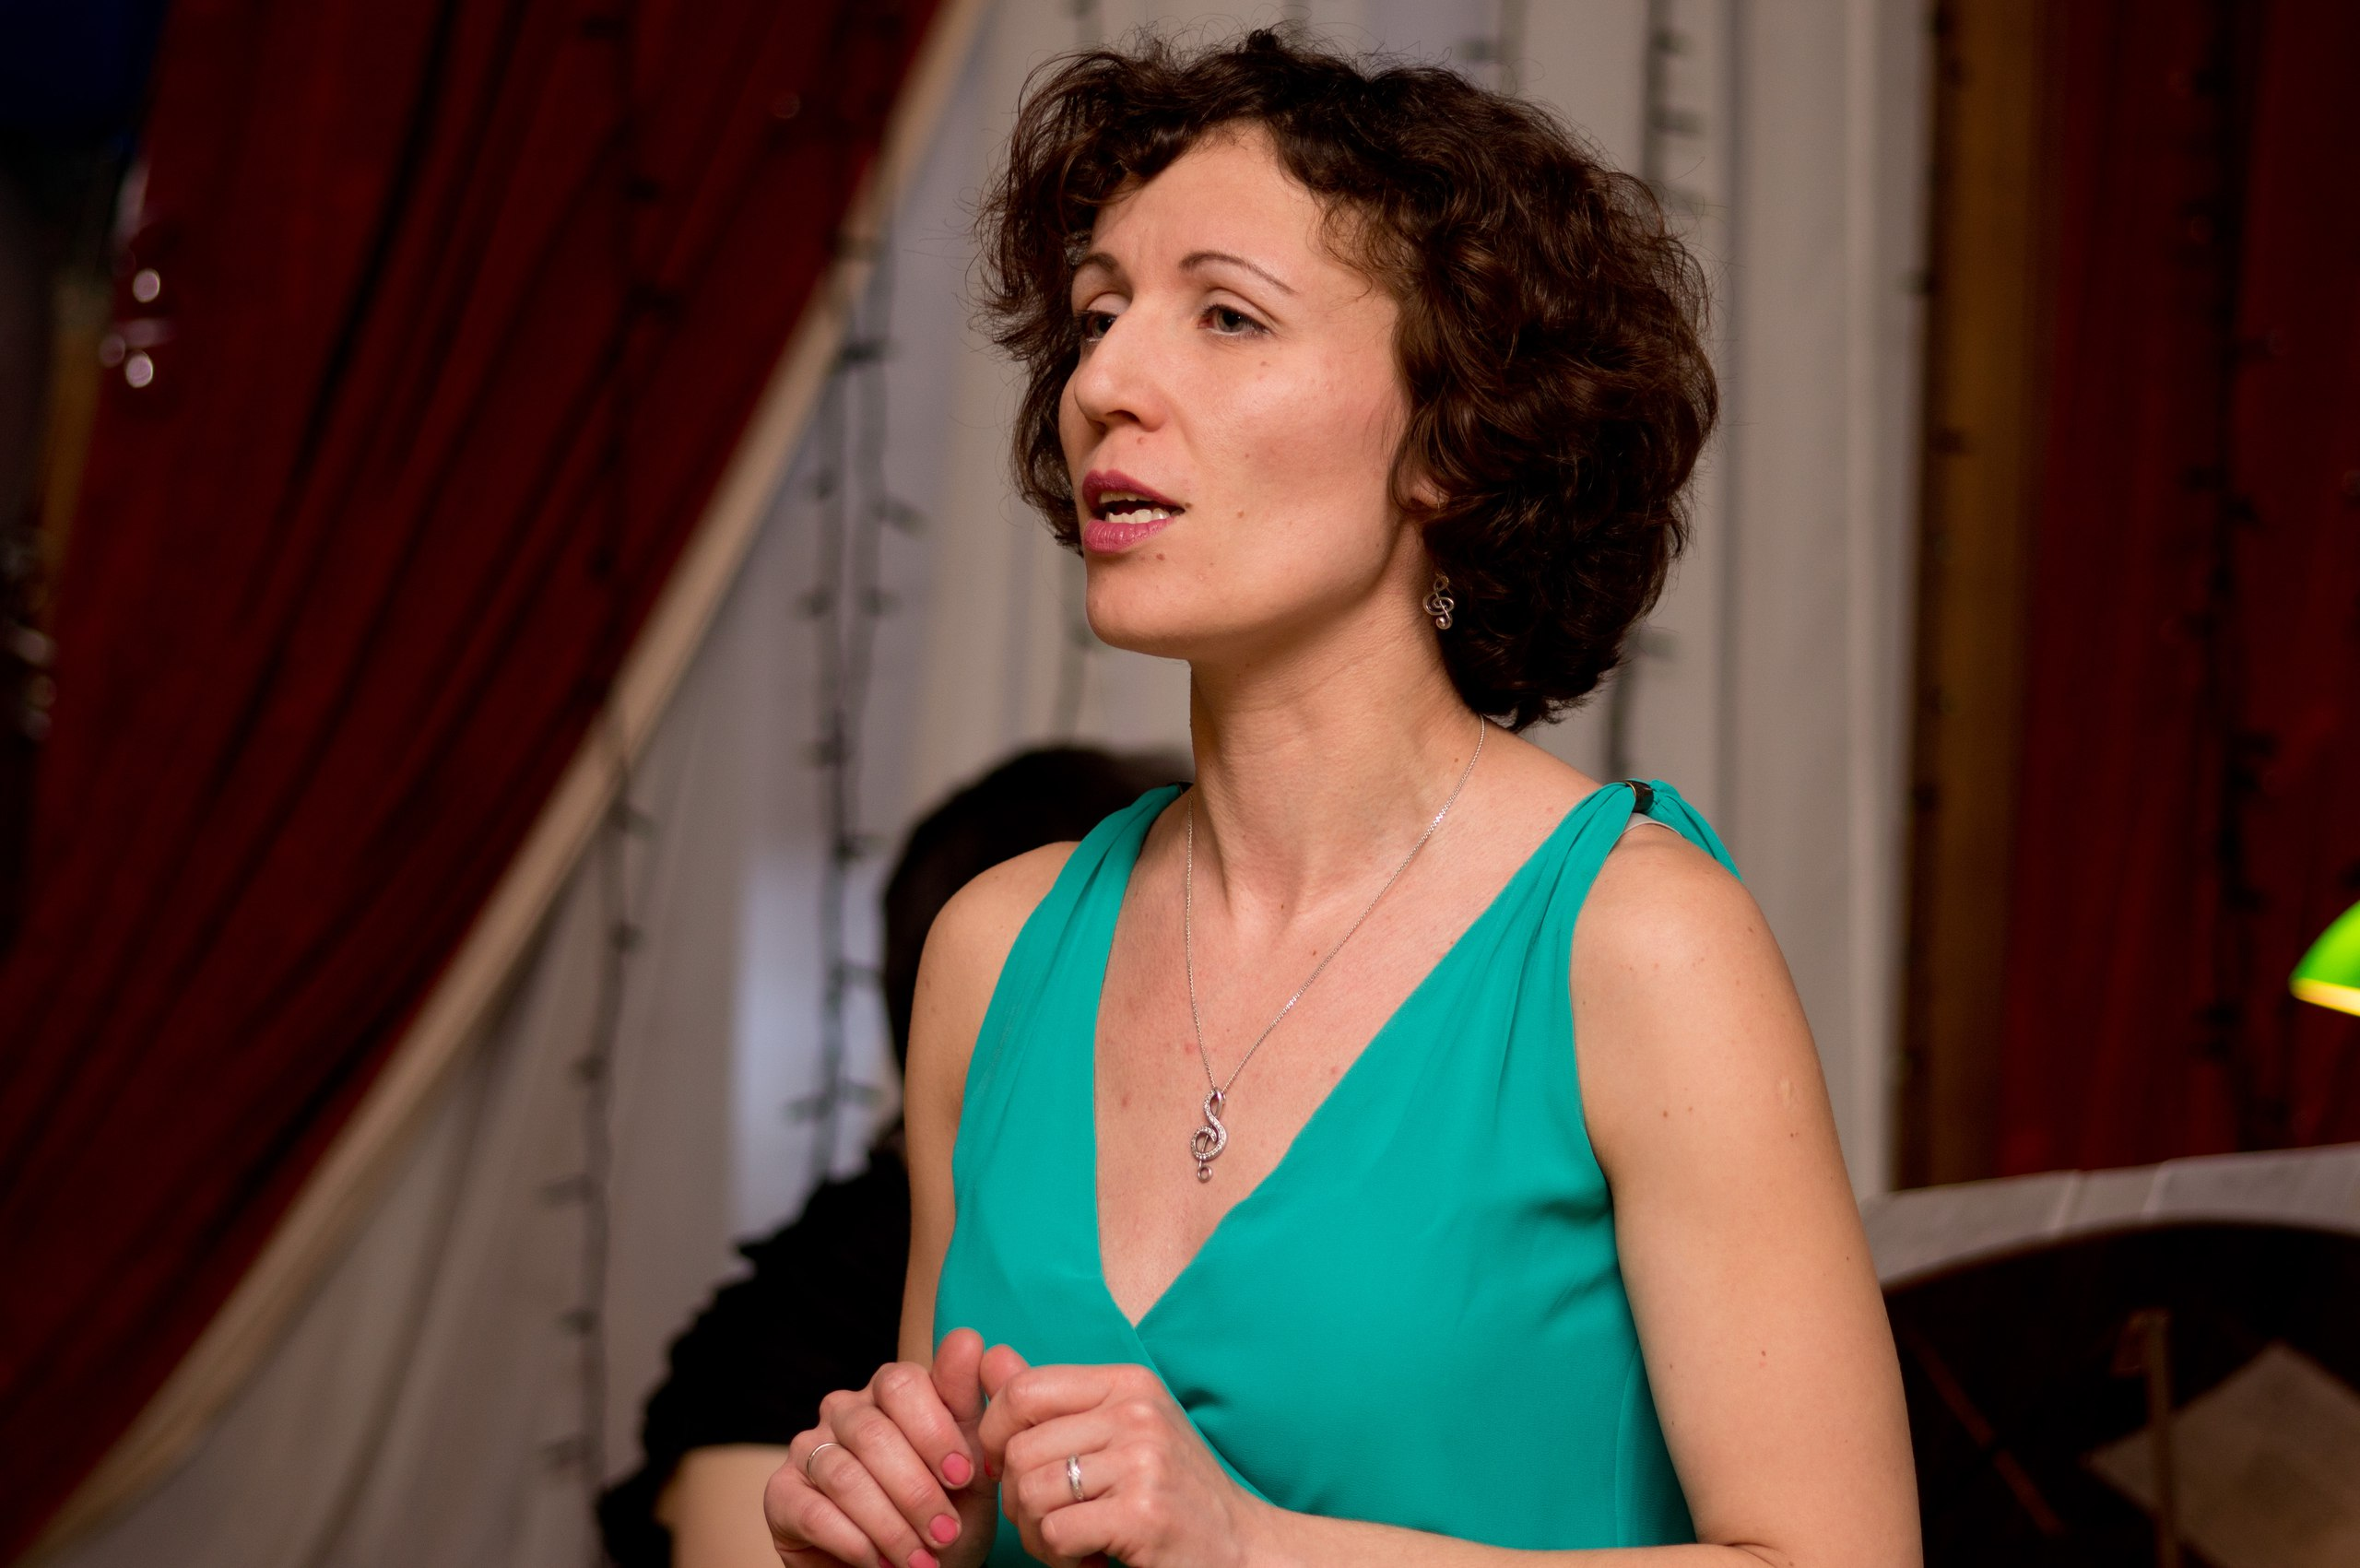 Tatiana Kazakova on her passion for music